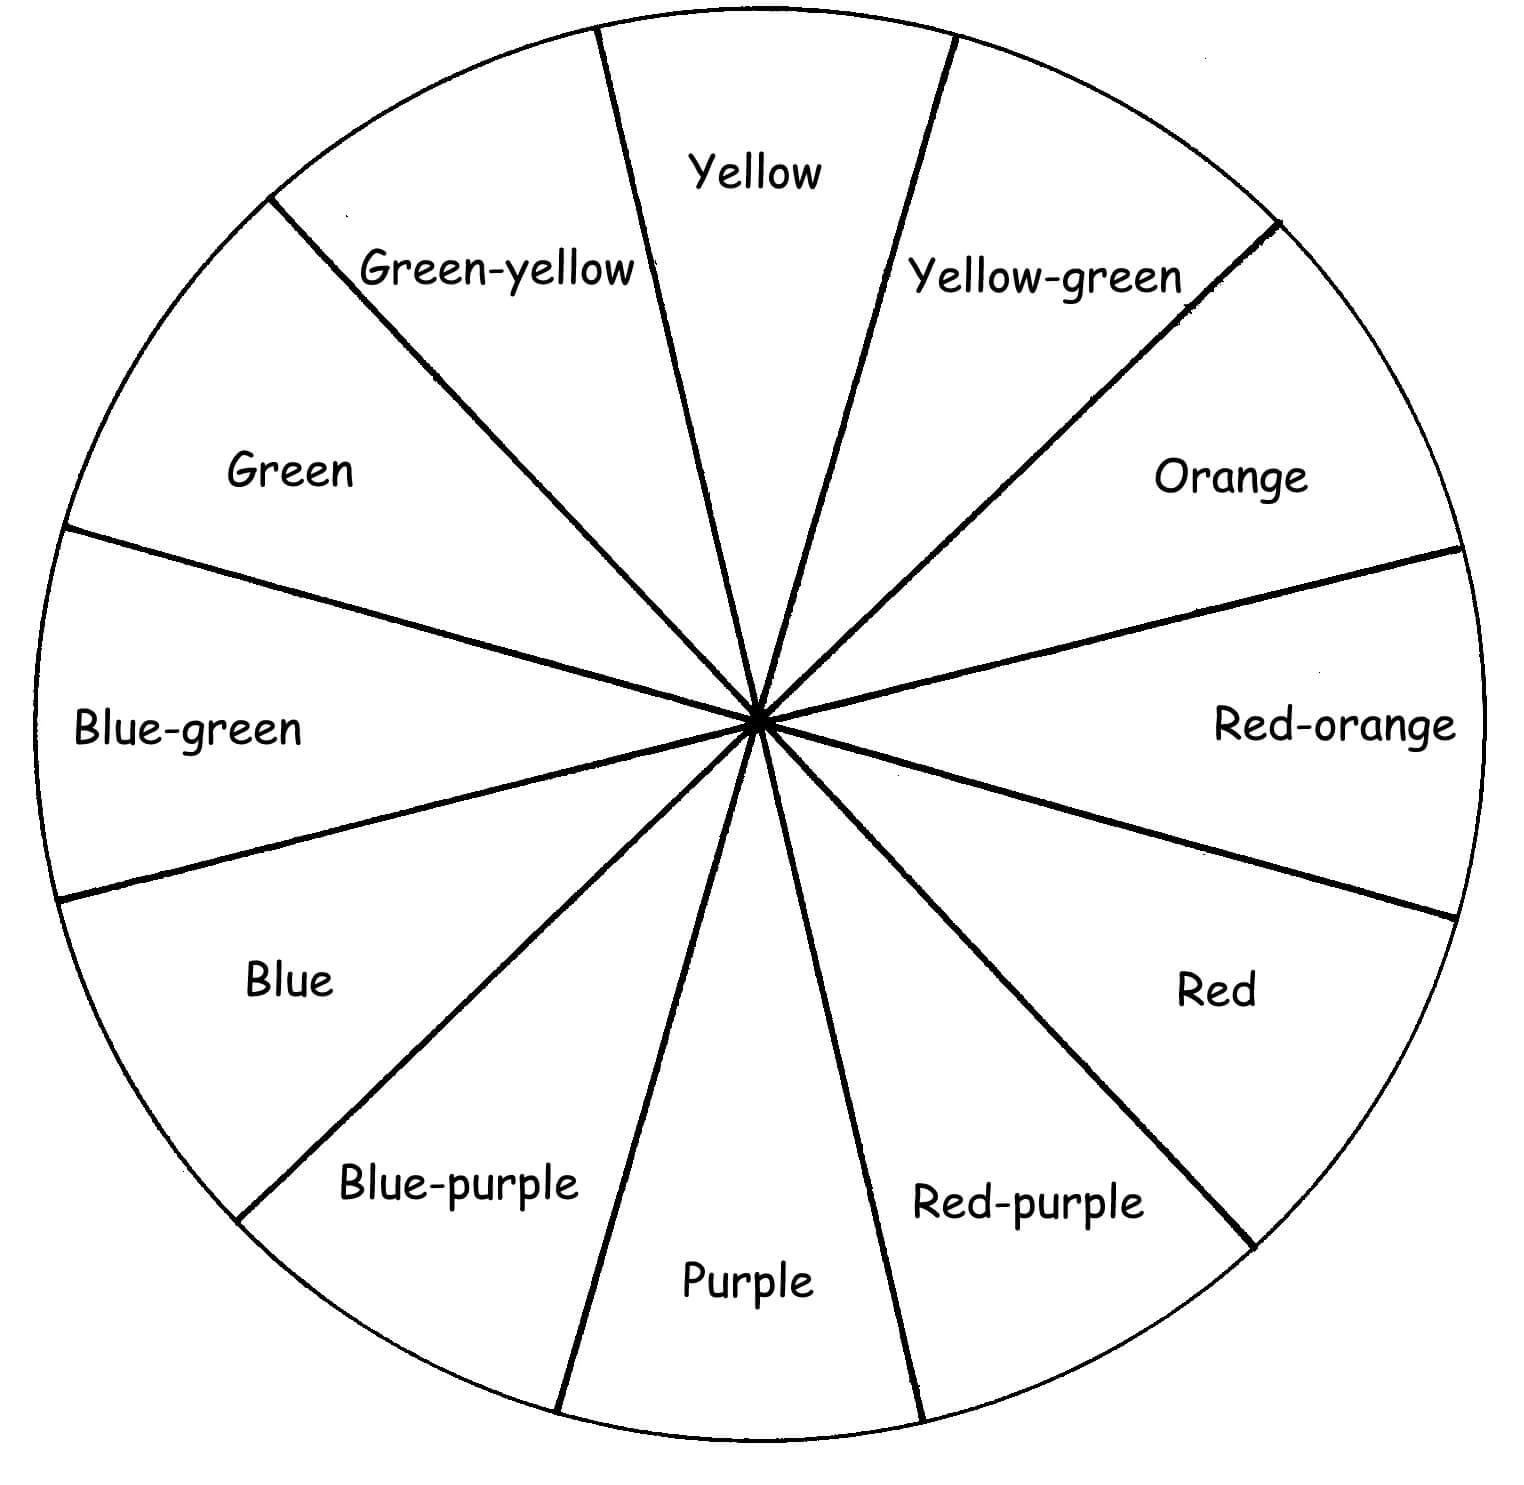 Blank Color Wheel Worksheet | Color Wheel Worksheet, Warm Within Blank Color Wheel Template